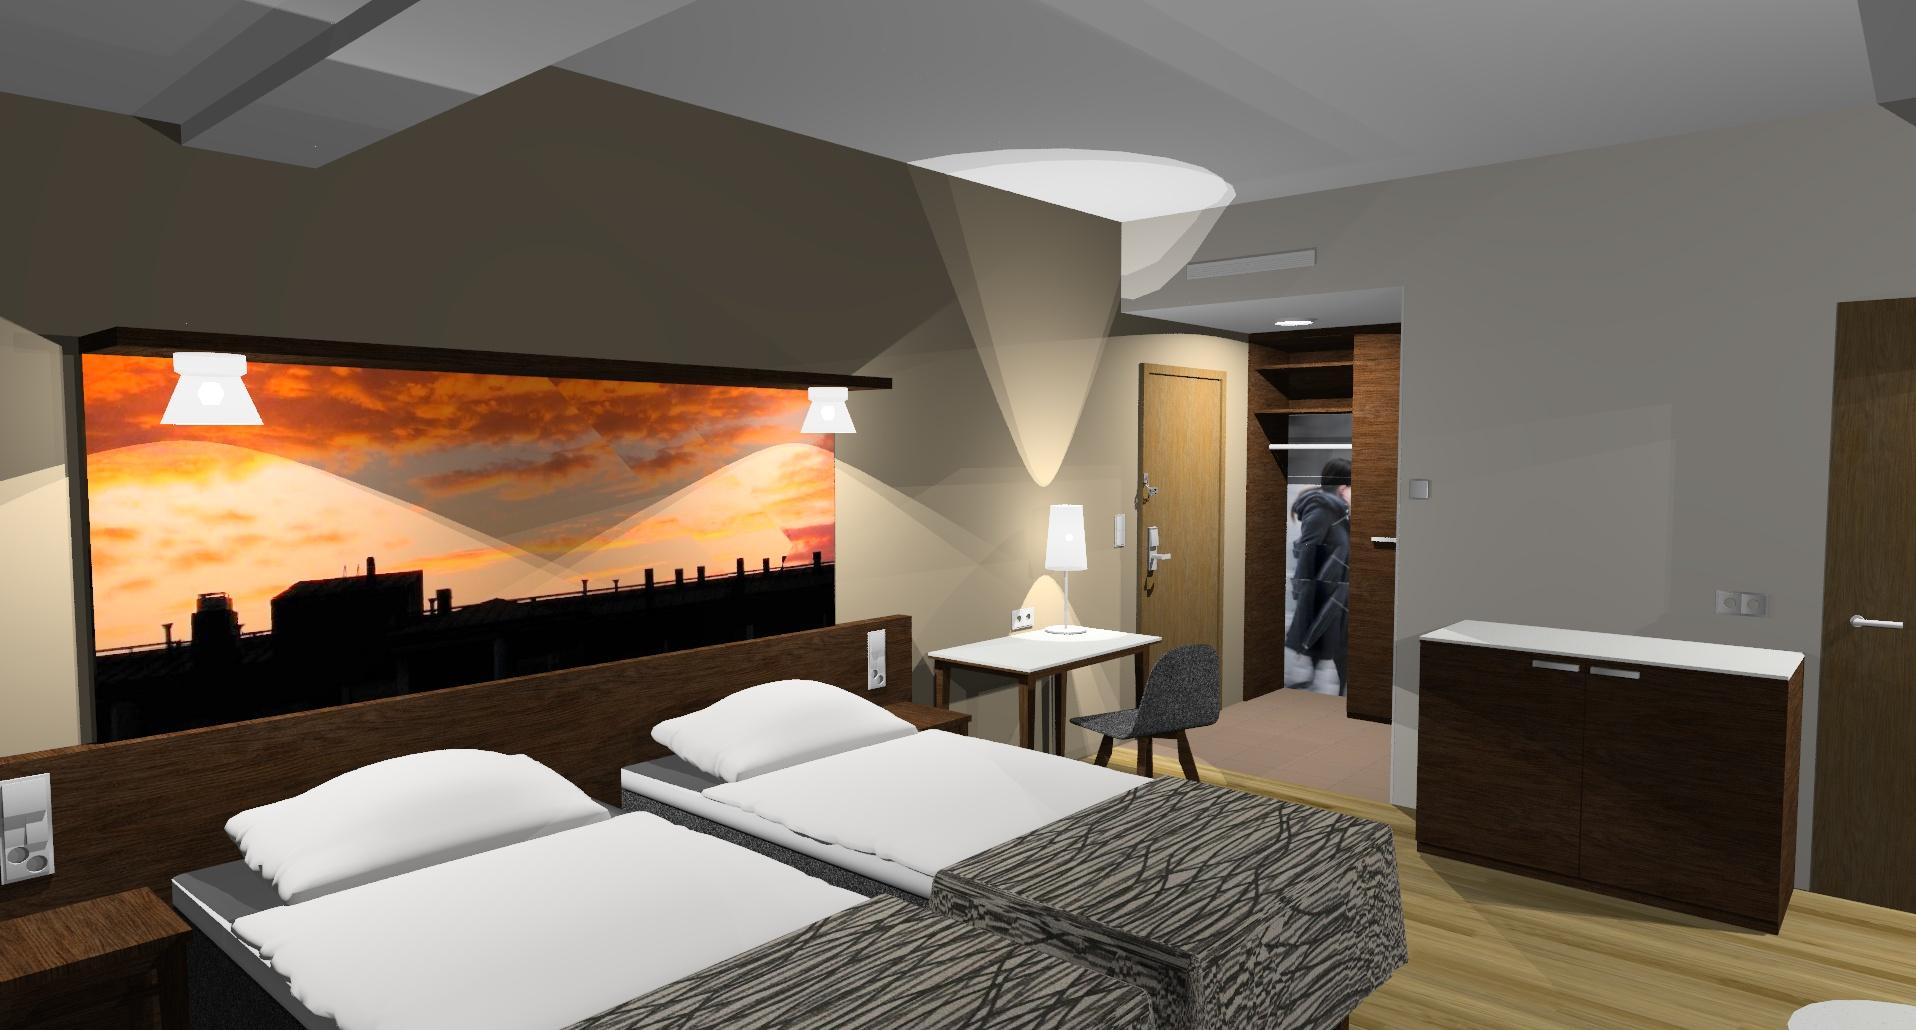 Restelin Helsingin Uutuuskohteesta Tulee Cumulus Hotelli